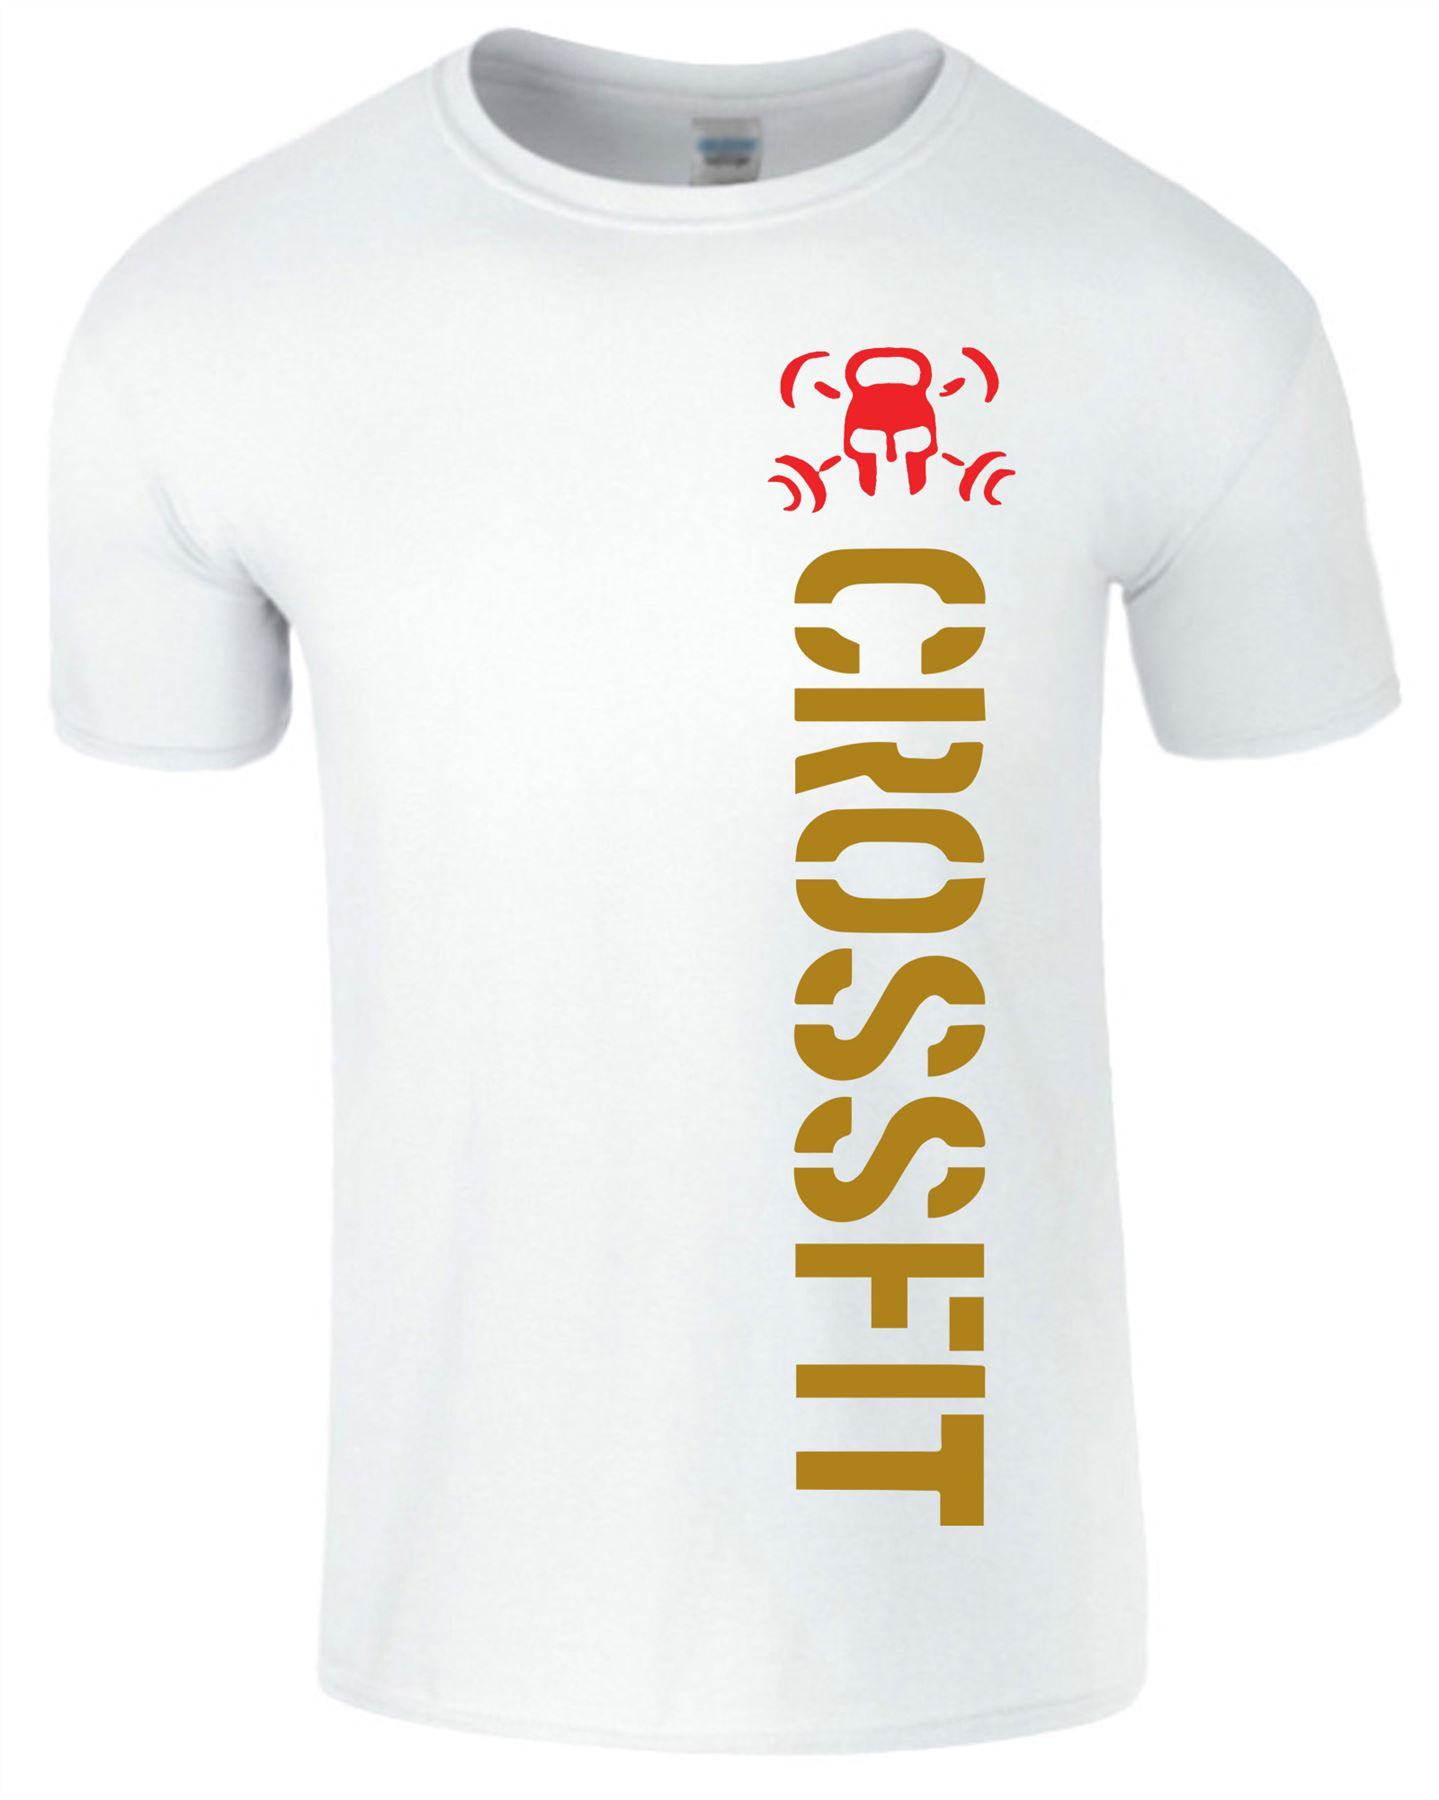 Crossfit-Mens-T-Shirt-Gym-Wear-Bodybuilding-Training-Workout-Fitness-T-Shirt Indexbild 22